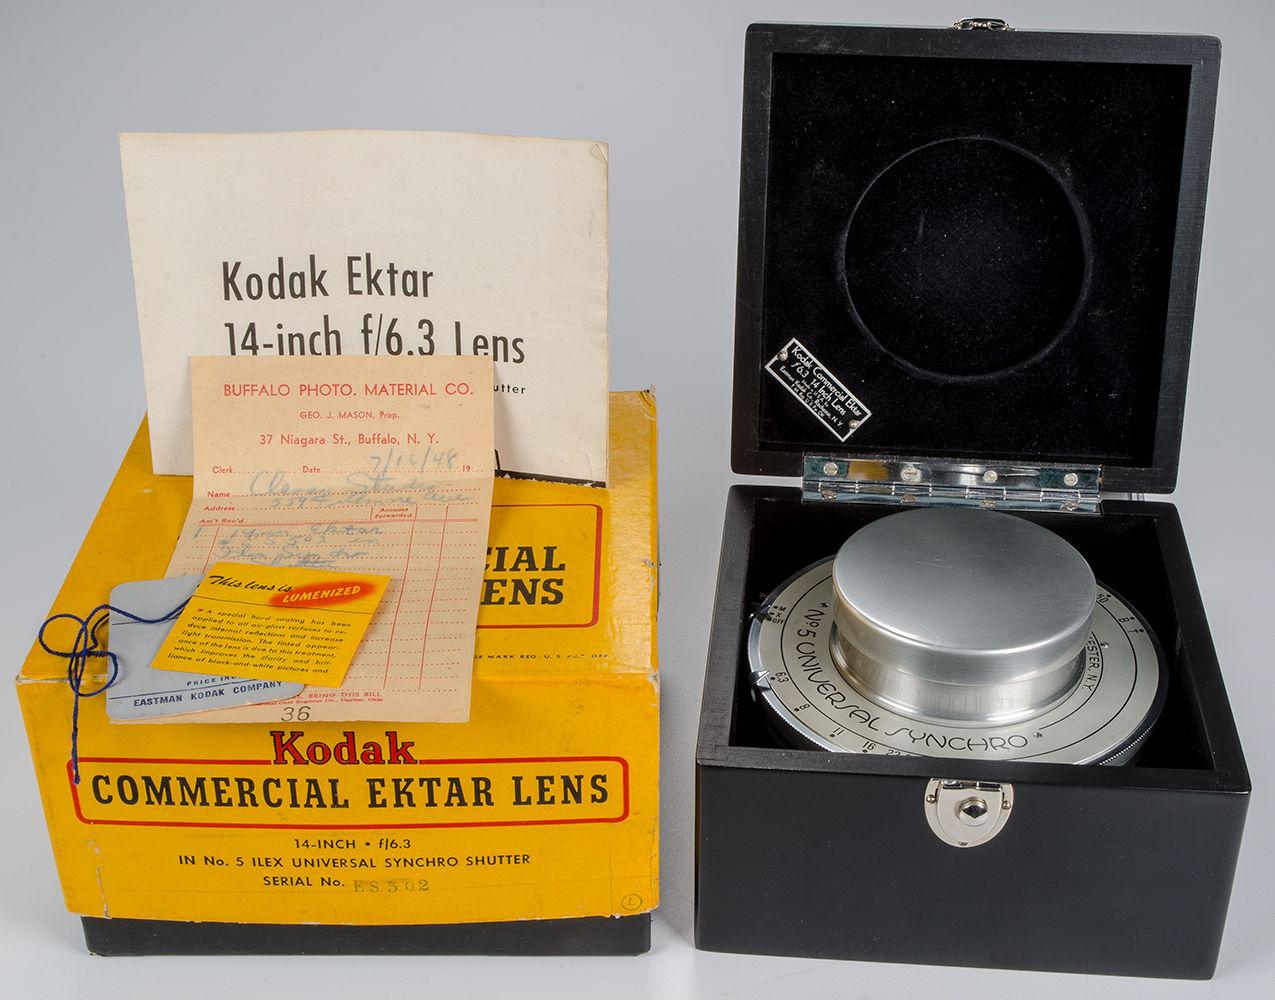 Kodak Commercial Ektar ILEX 14 inch Lens f6.3 Universal Synchro Shutter in Original Boxes 1